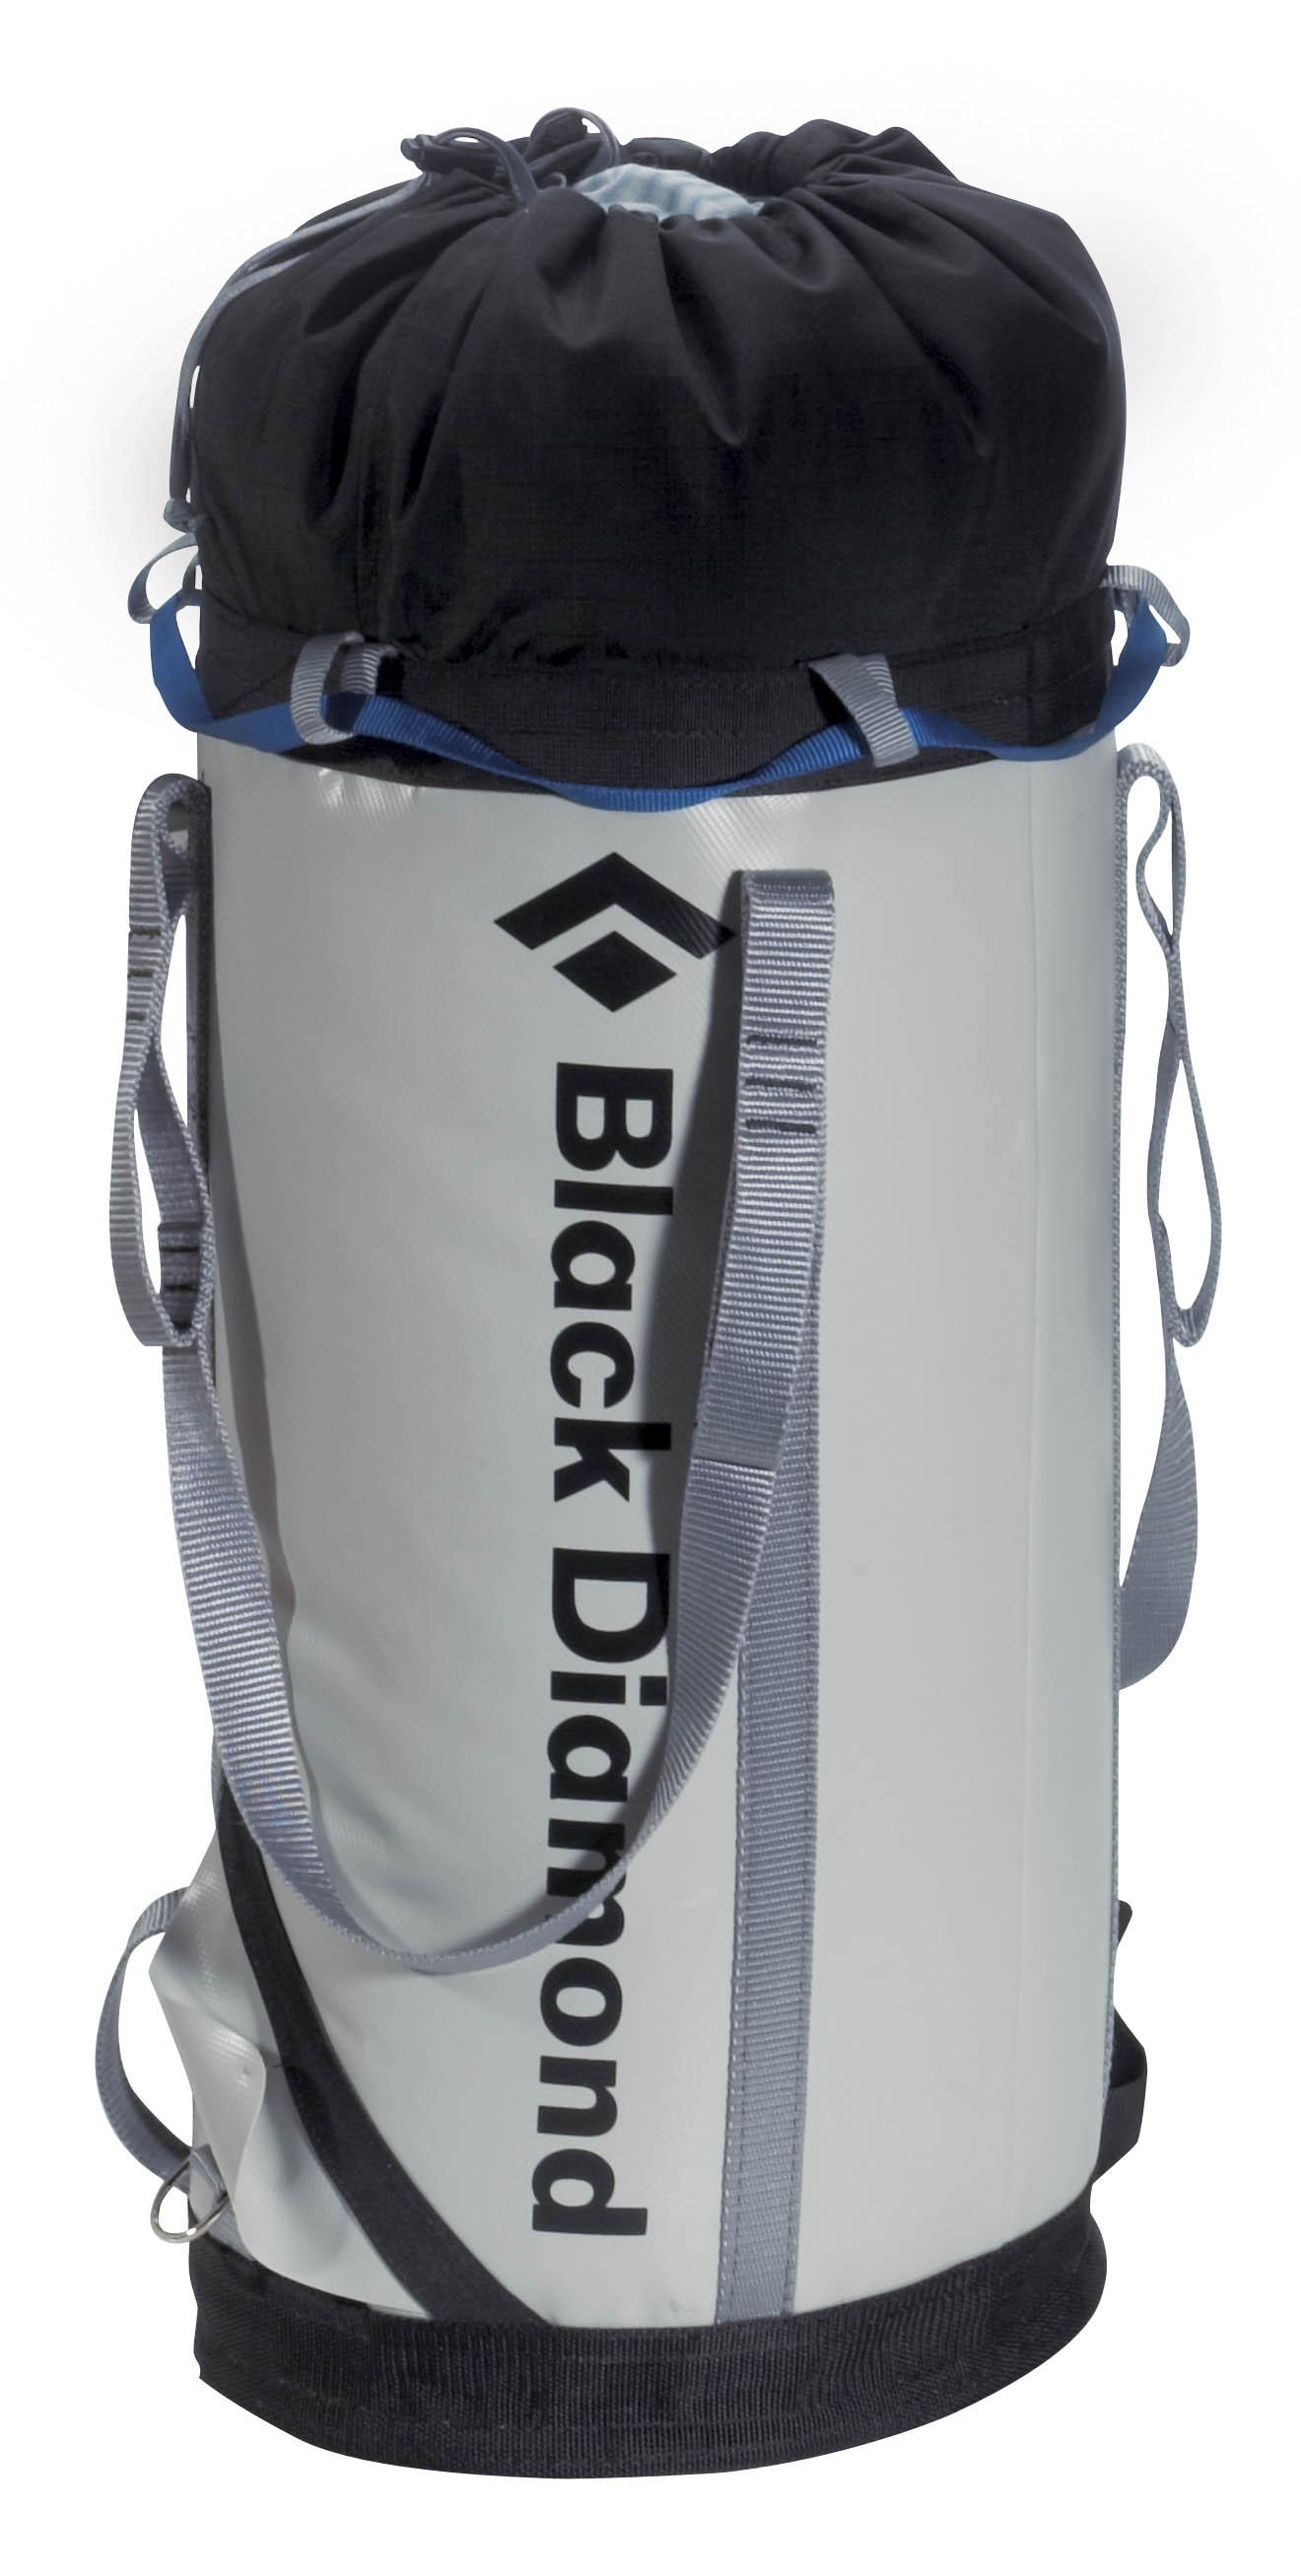 Black Diamond Stubby 35 Haul Bag - Sac de hissage